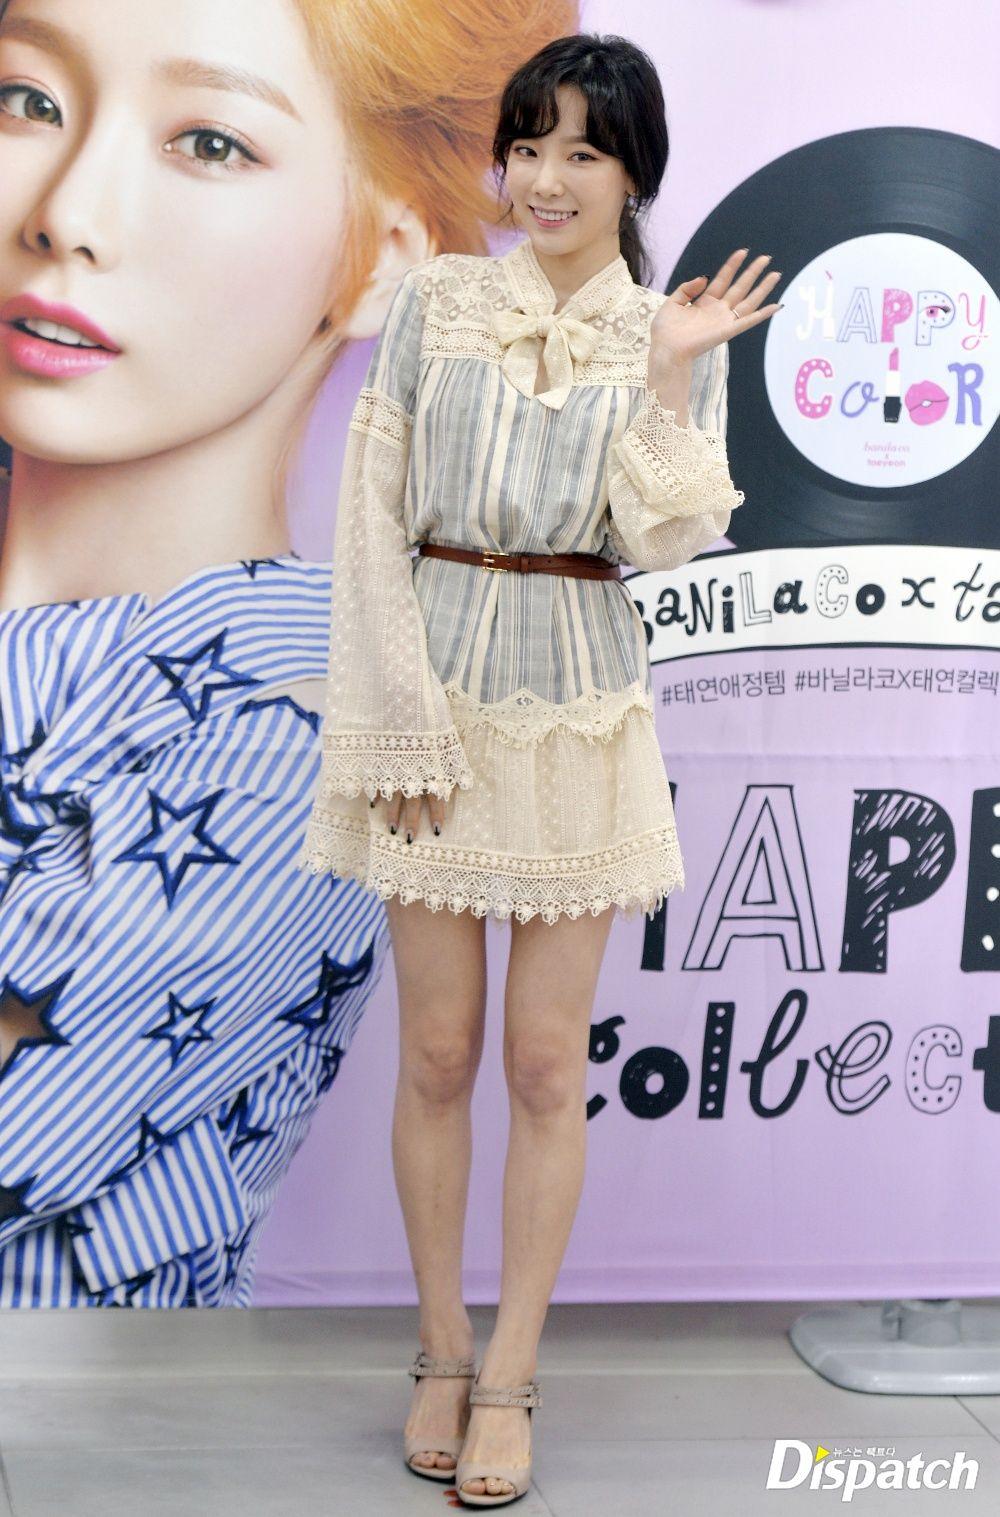 9 Female Idols With Perfect Proportions Despite Being Short Koreaboo Girls Generation Taeyeon Korean Girl